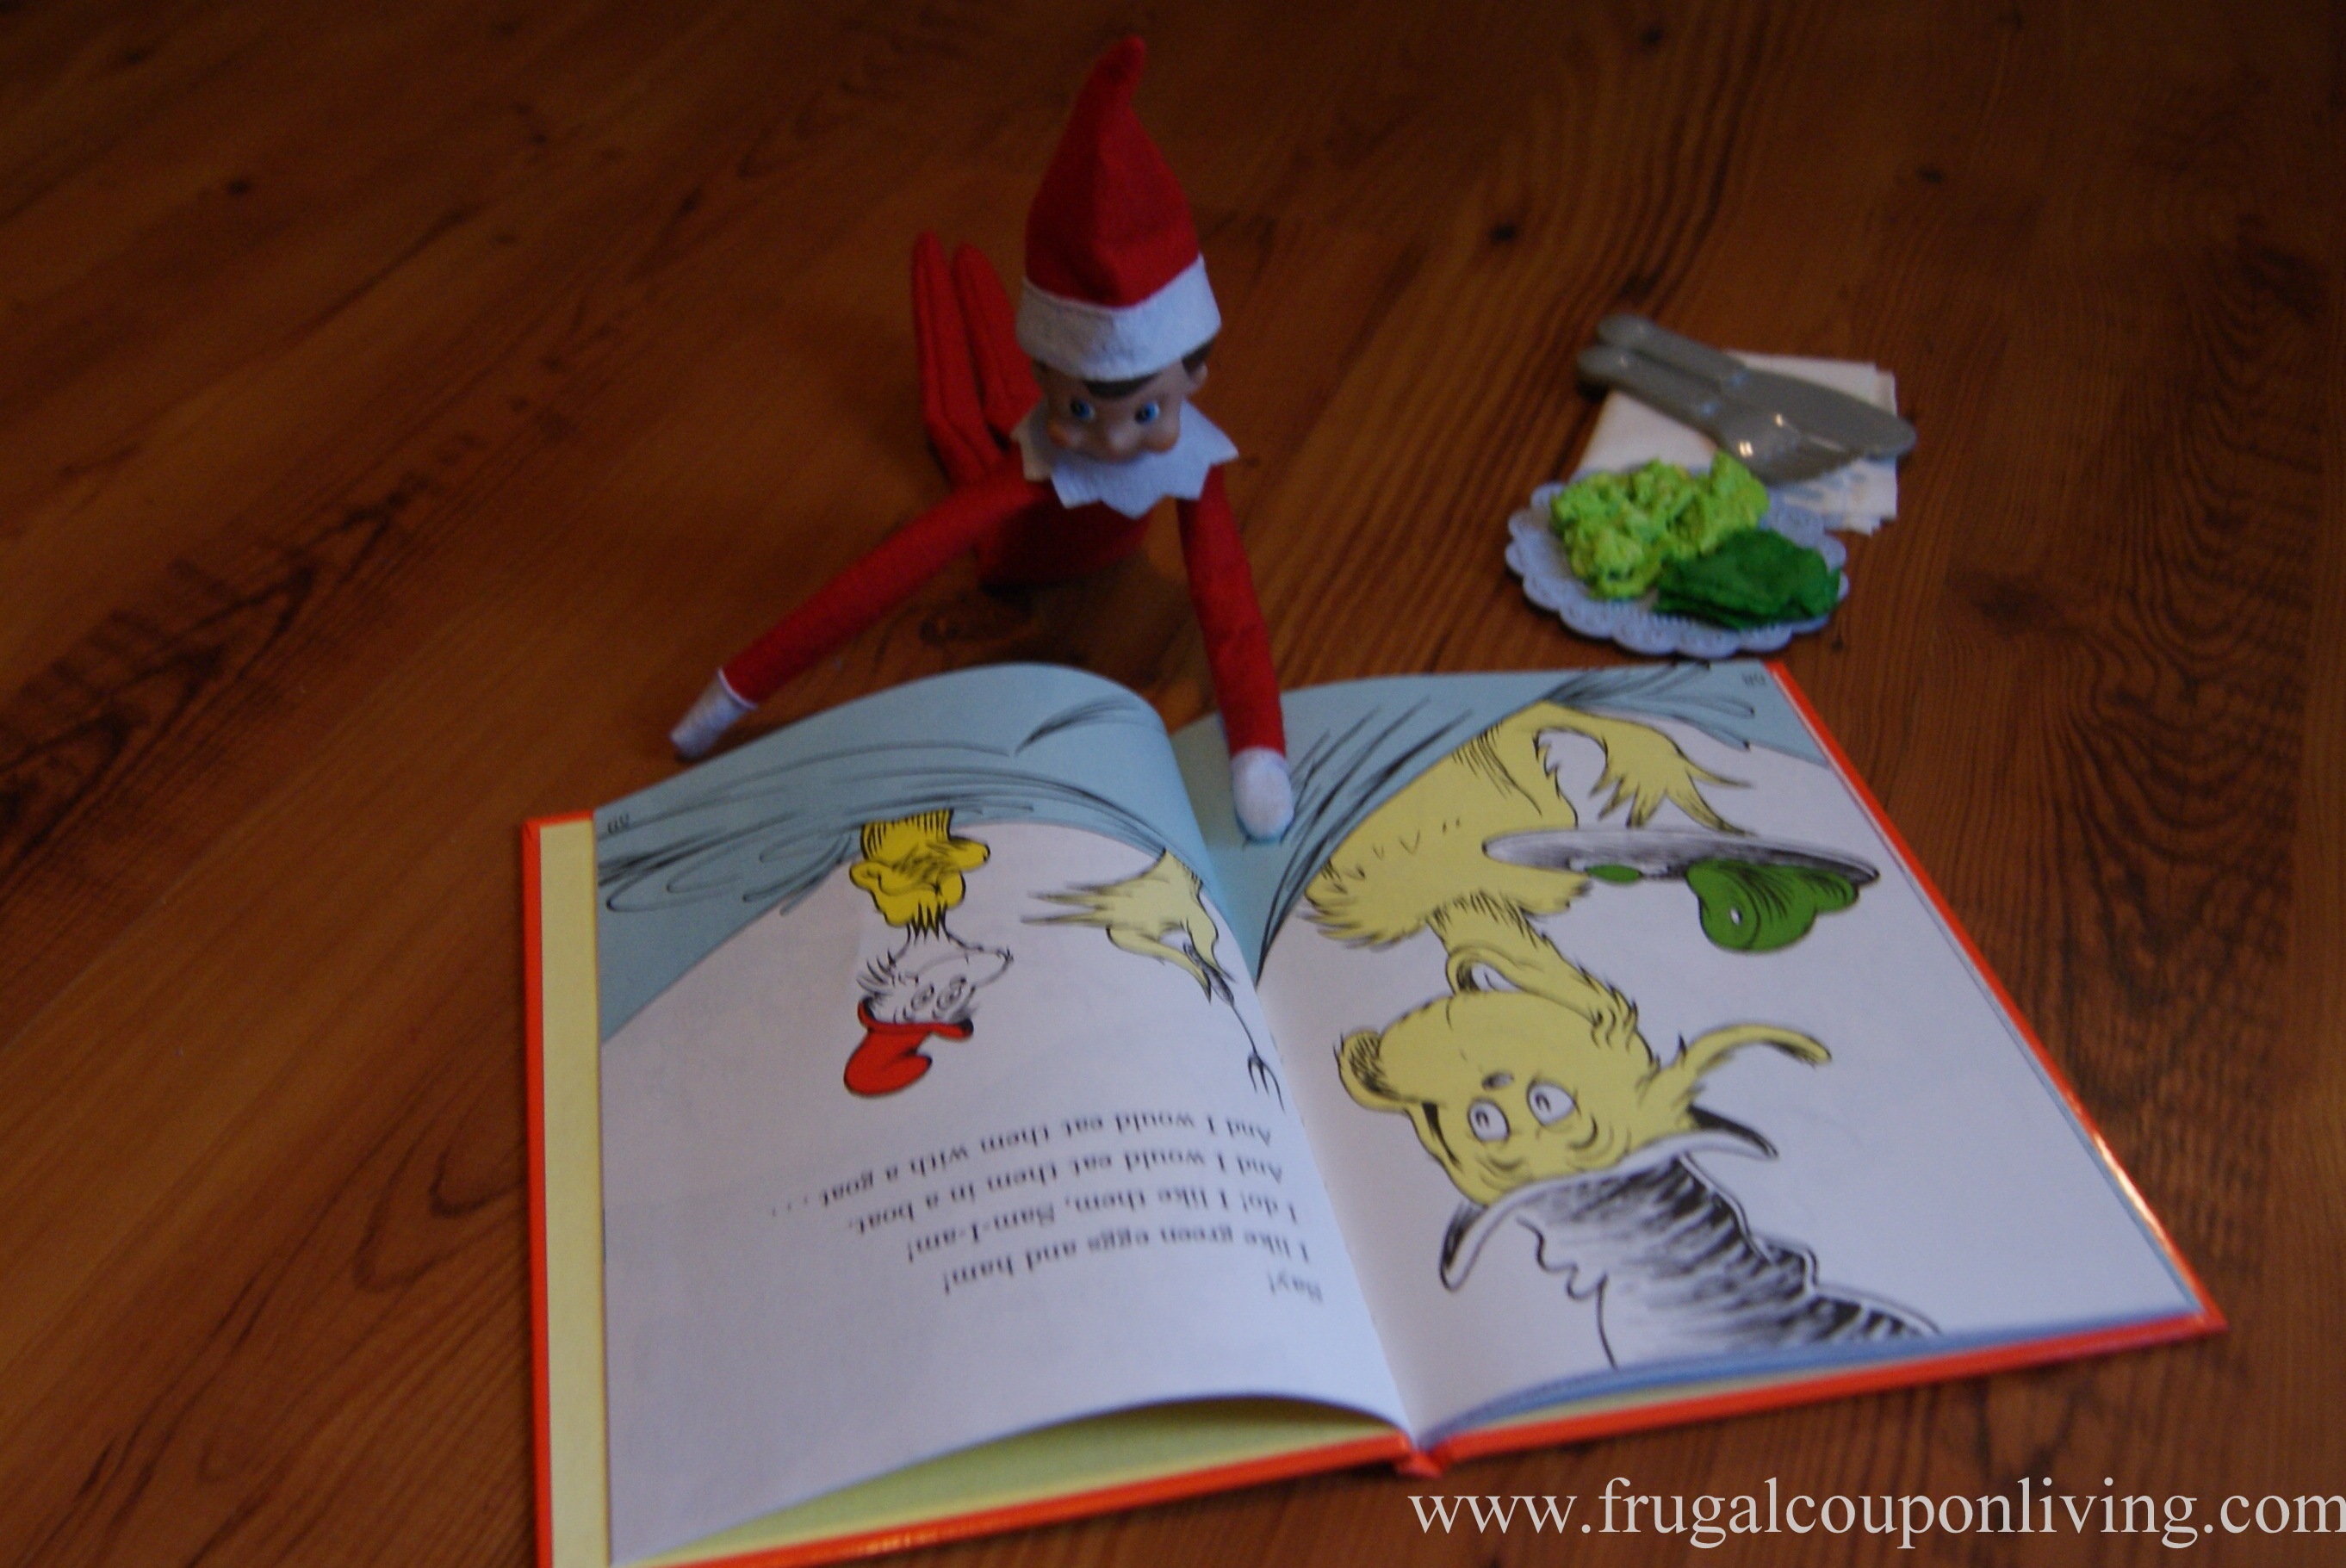 elf-on-the-shelf-ideas-green-eggs-and-ham